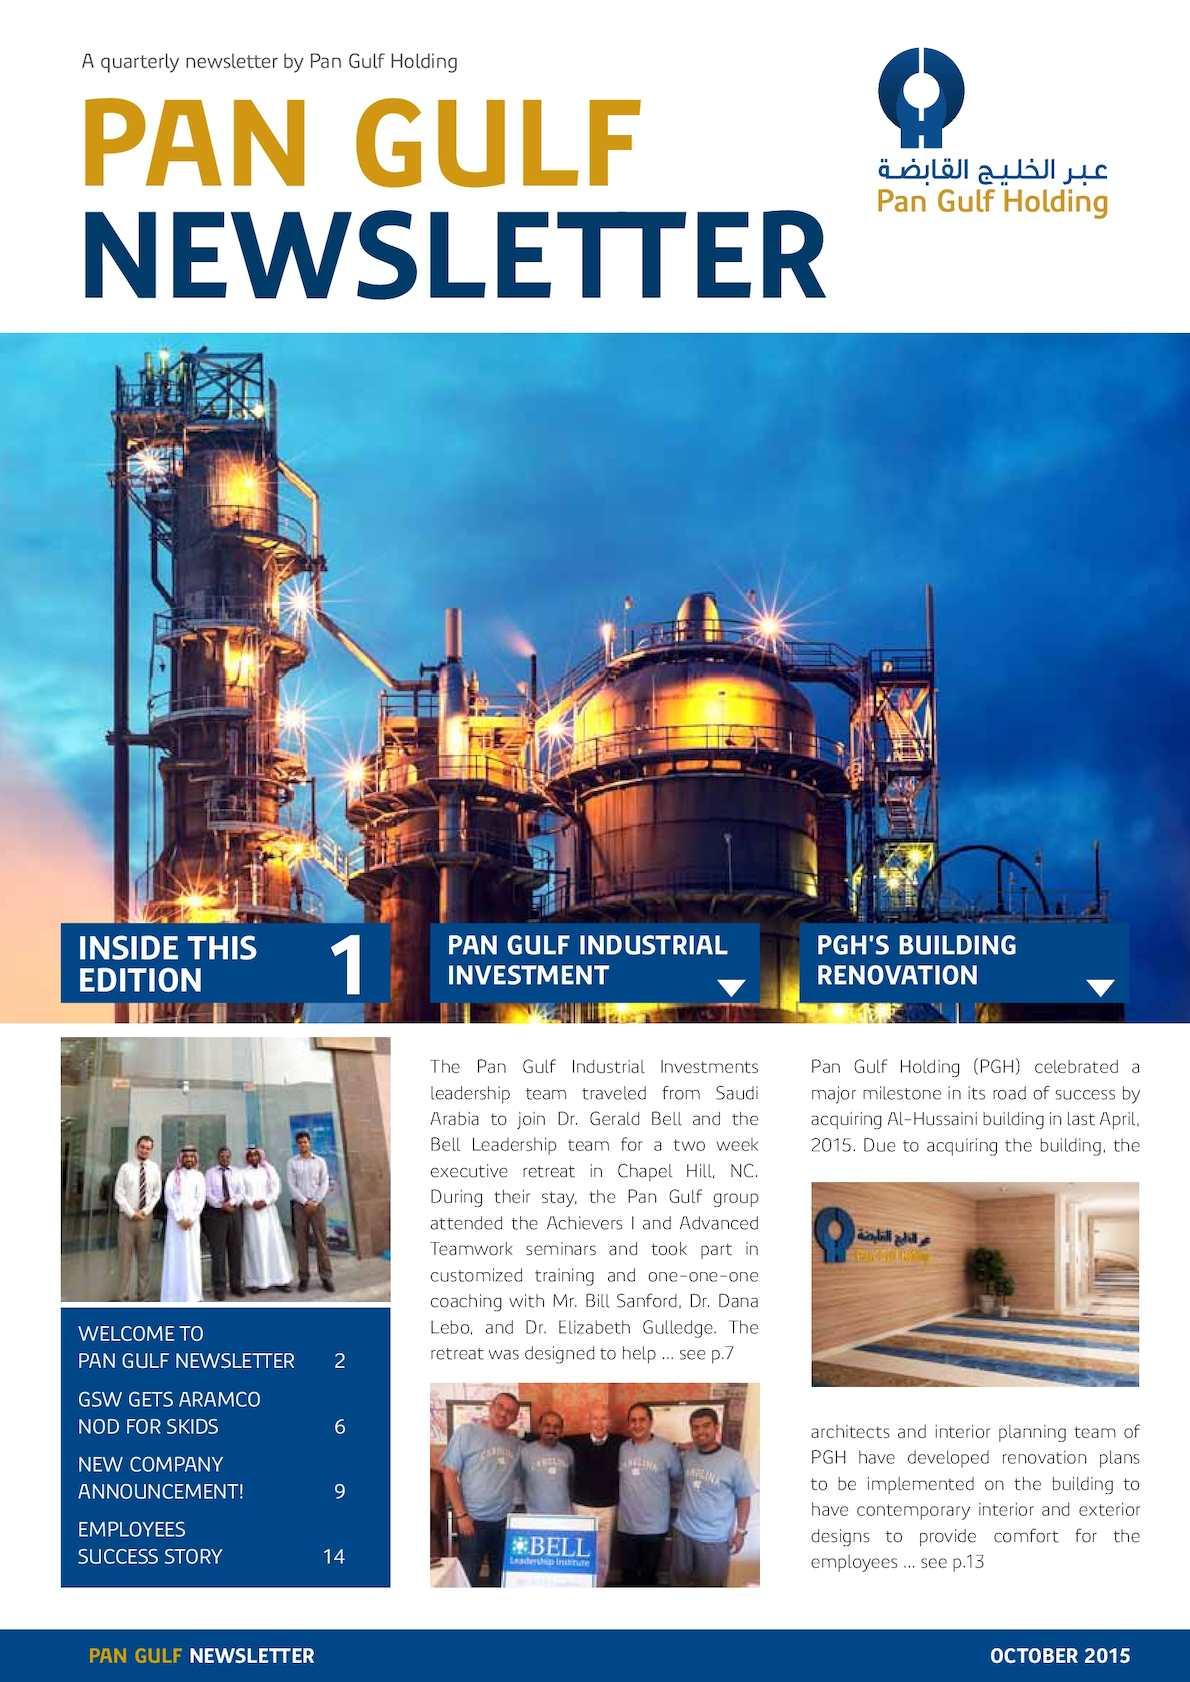 Calaméo - Pangulf Newsletter Oct 2015